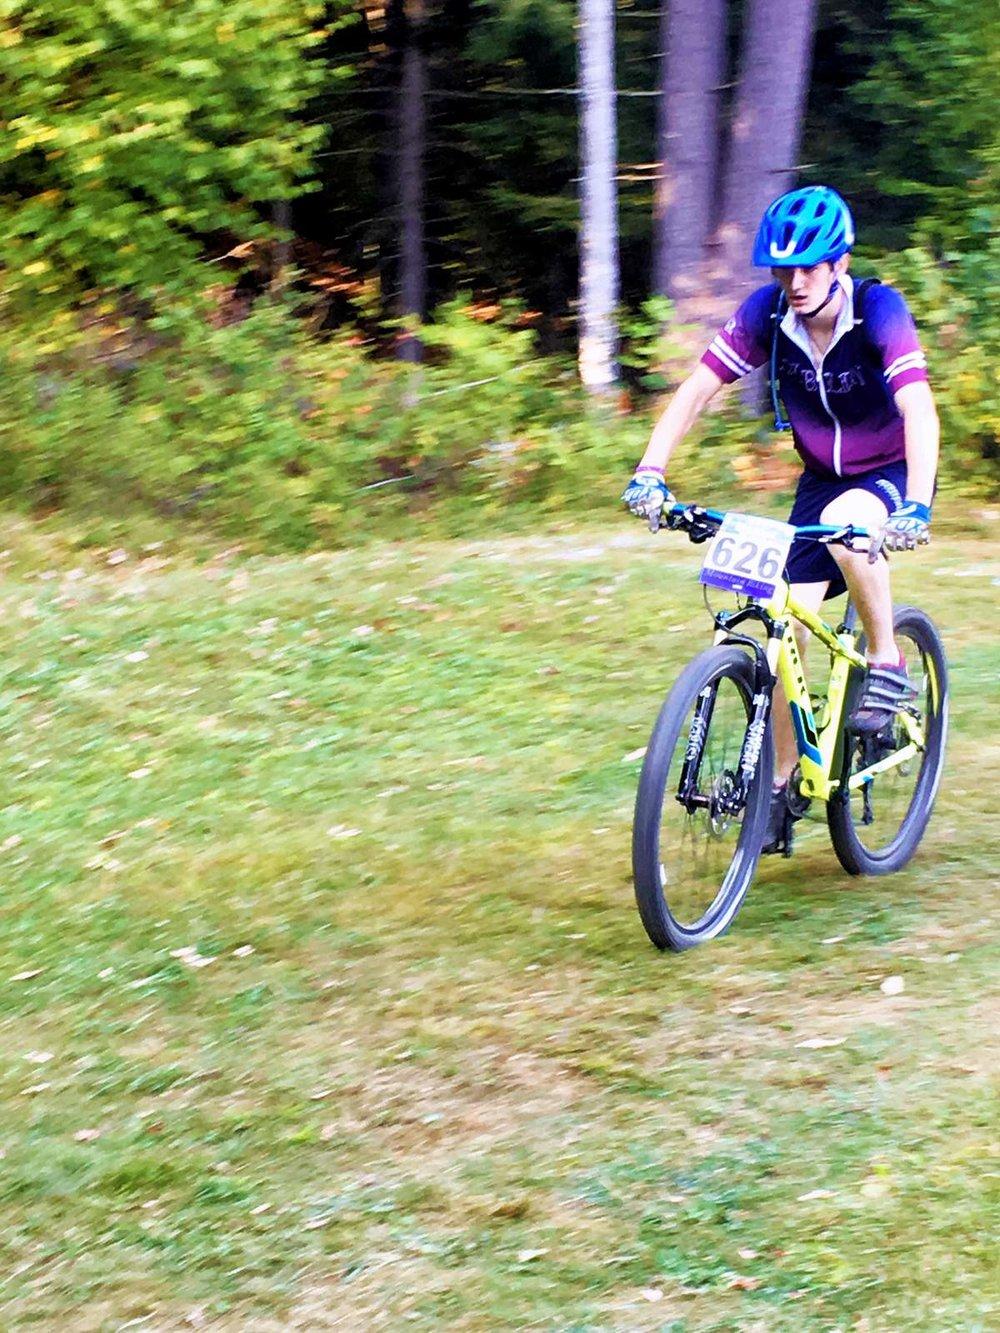 Mountain Biking at Vermont Academy - September 27, 2017  - 7934.JPG